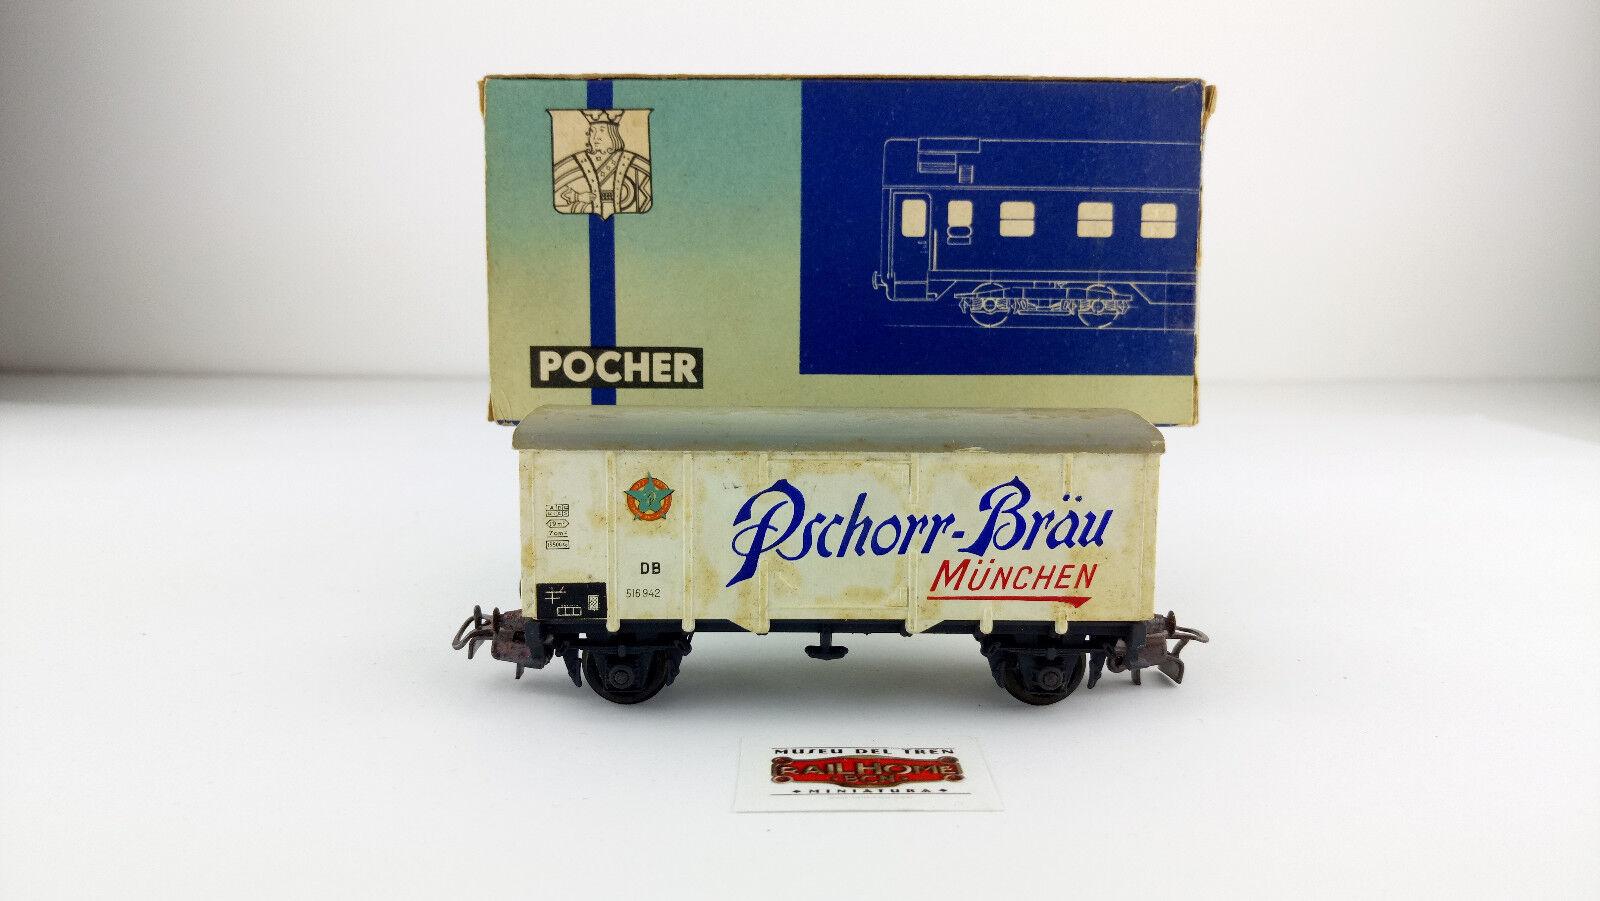 POCHER H0 324 - VAGÓN MERCANCÍAS DB  PSCHORR-BRÄU  - OVP